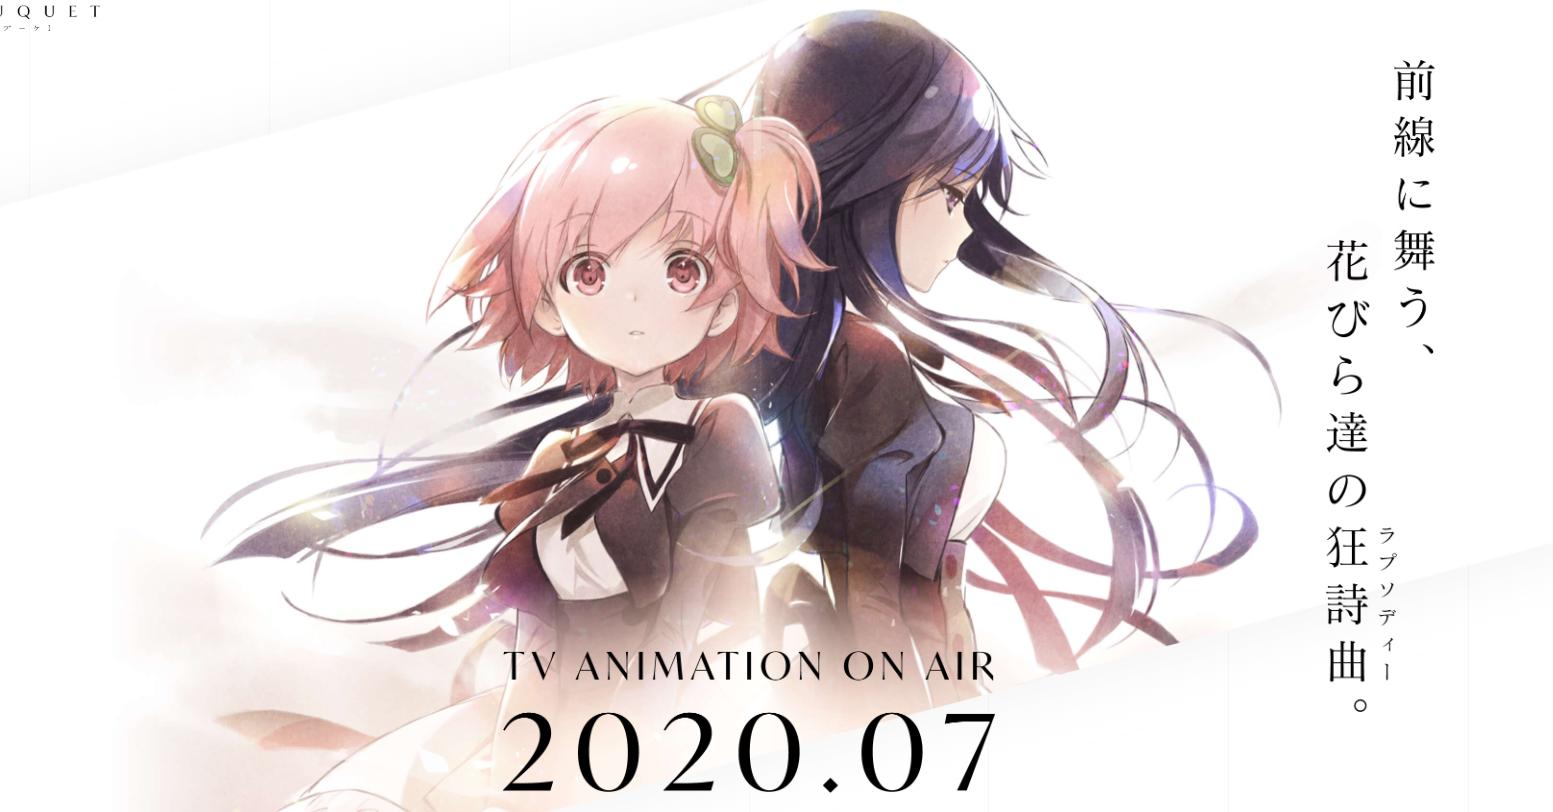 SHAFT新作动画《Assault Lily BOUQUET》预告公开,2020年7月播出- ACG17.COM